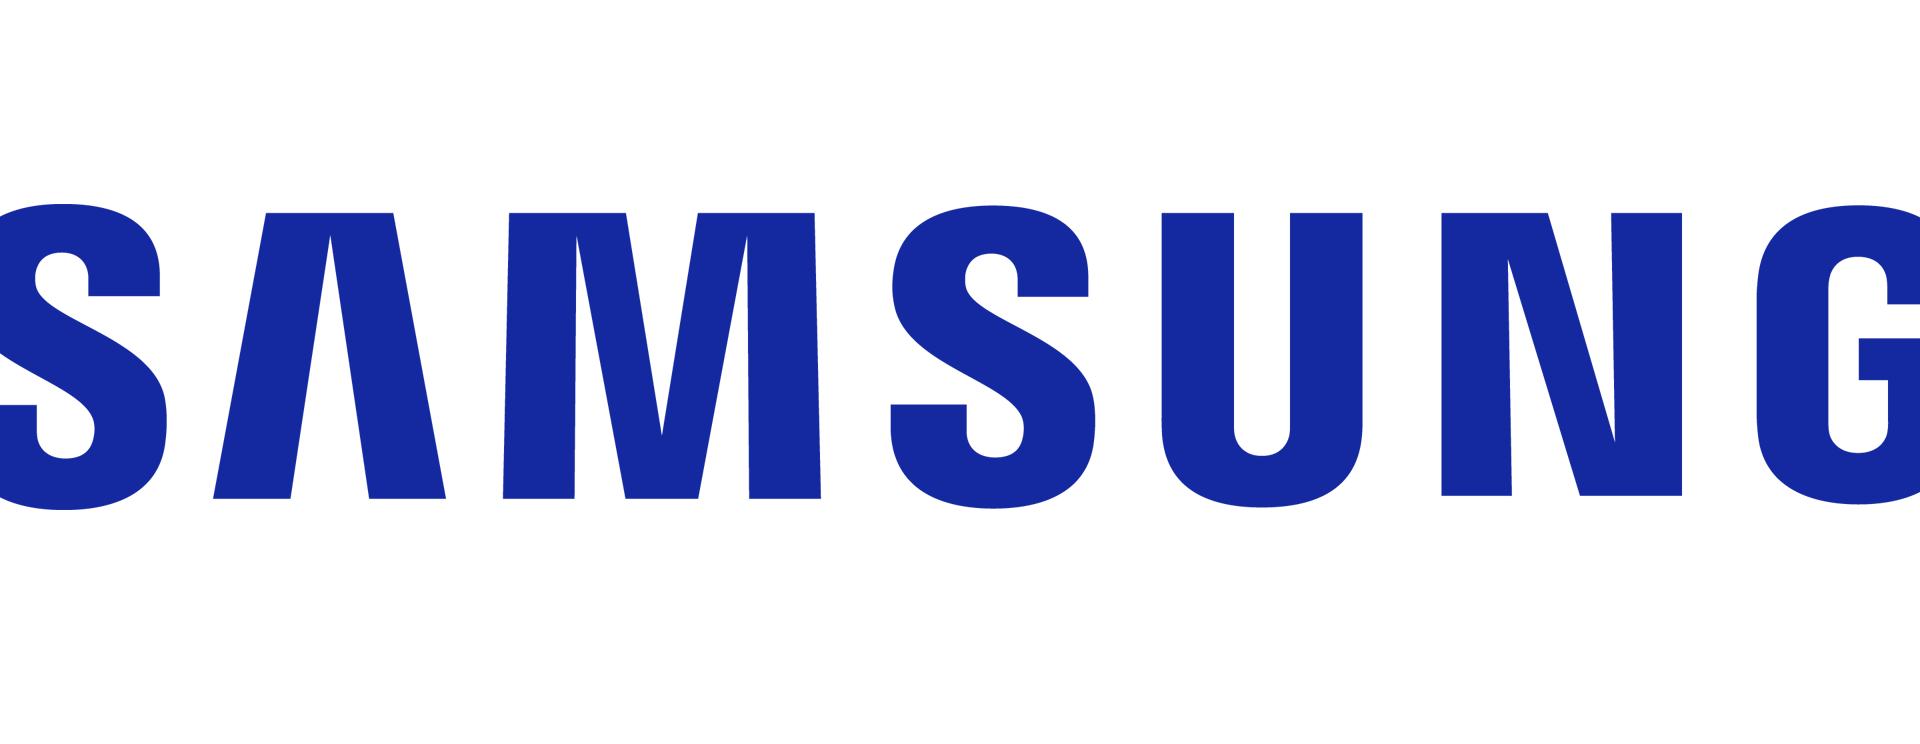 Samsung_logo_blue